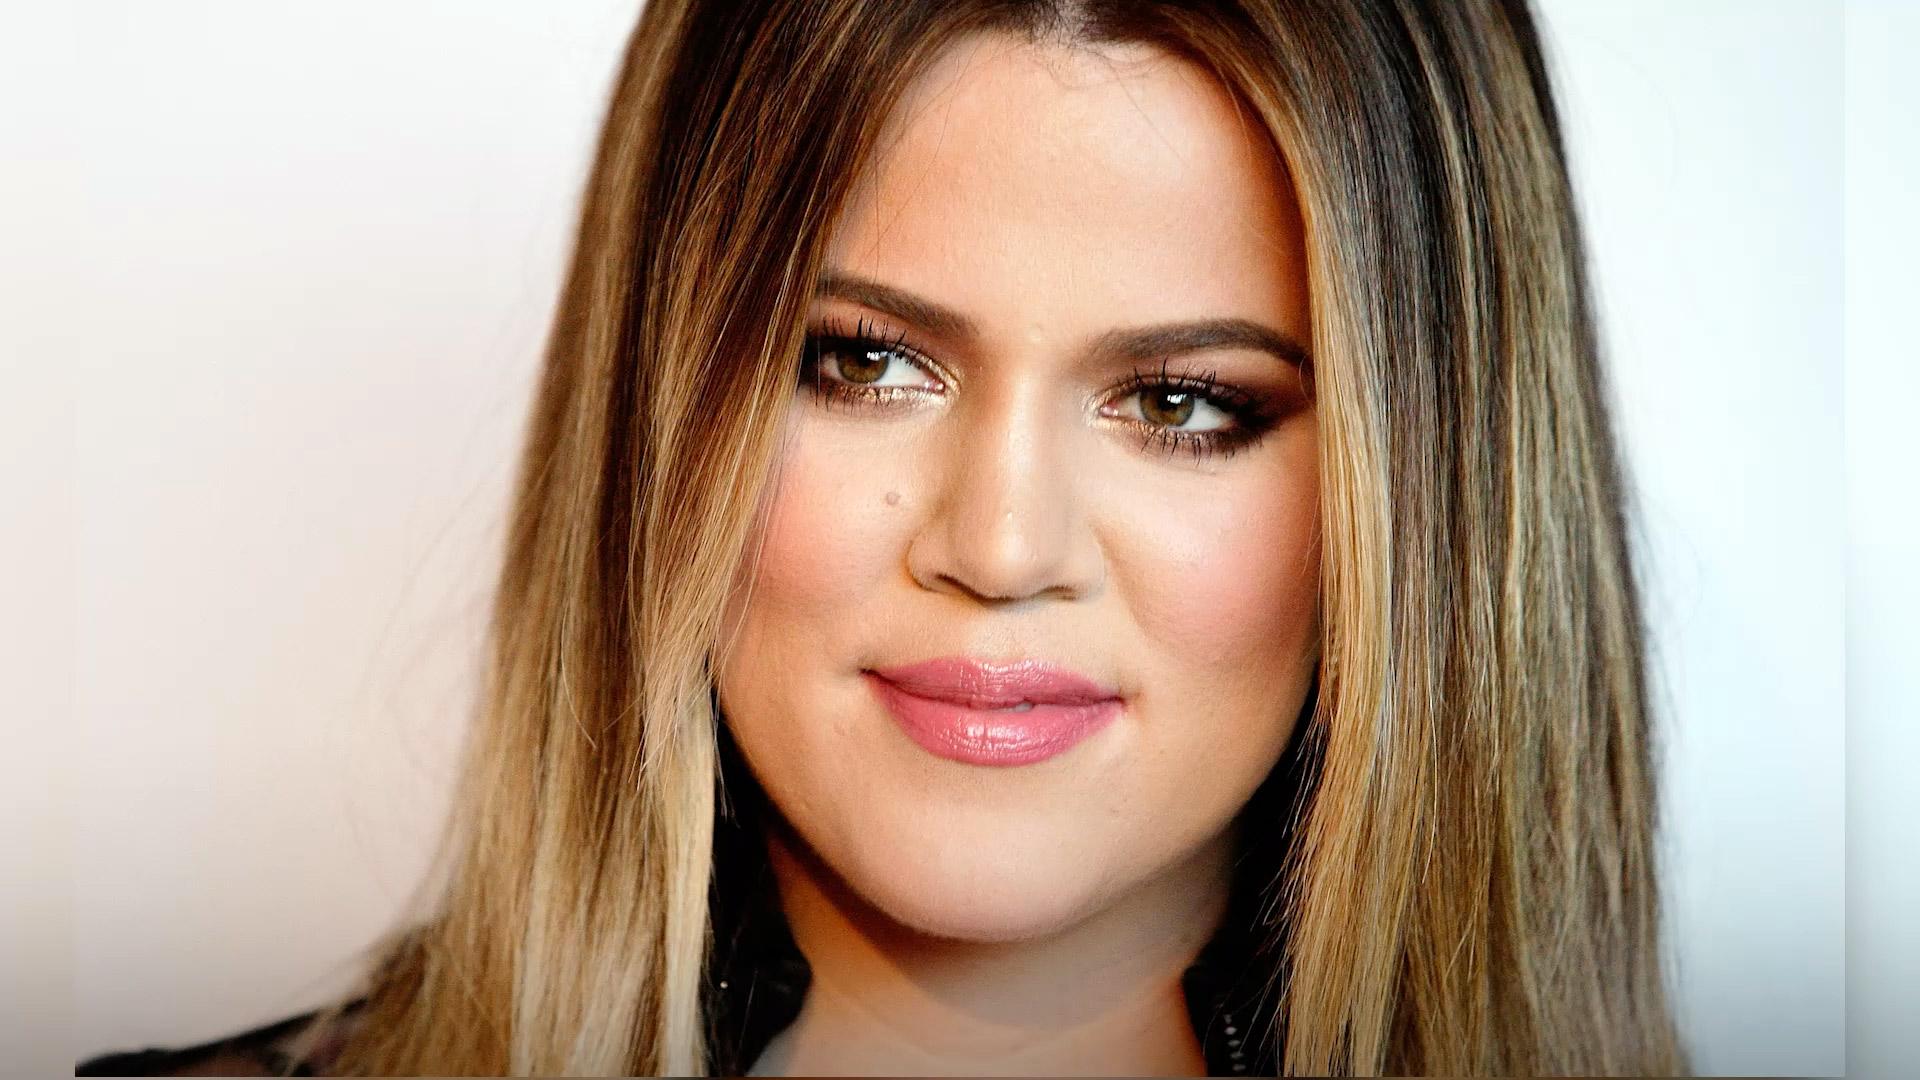 Kim Kardashian New Hairstyle Hair Trends Summer 2017 Lookbook